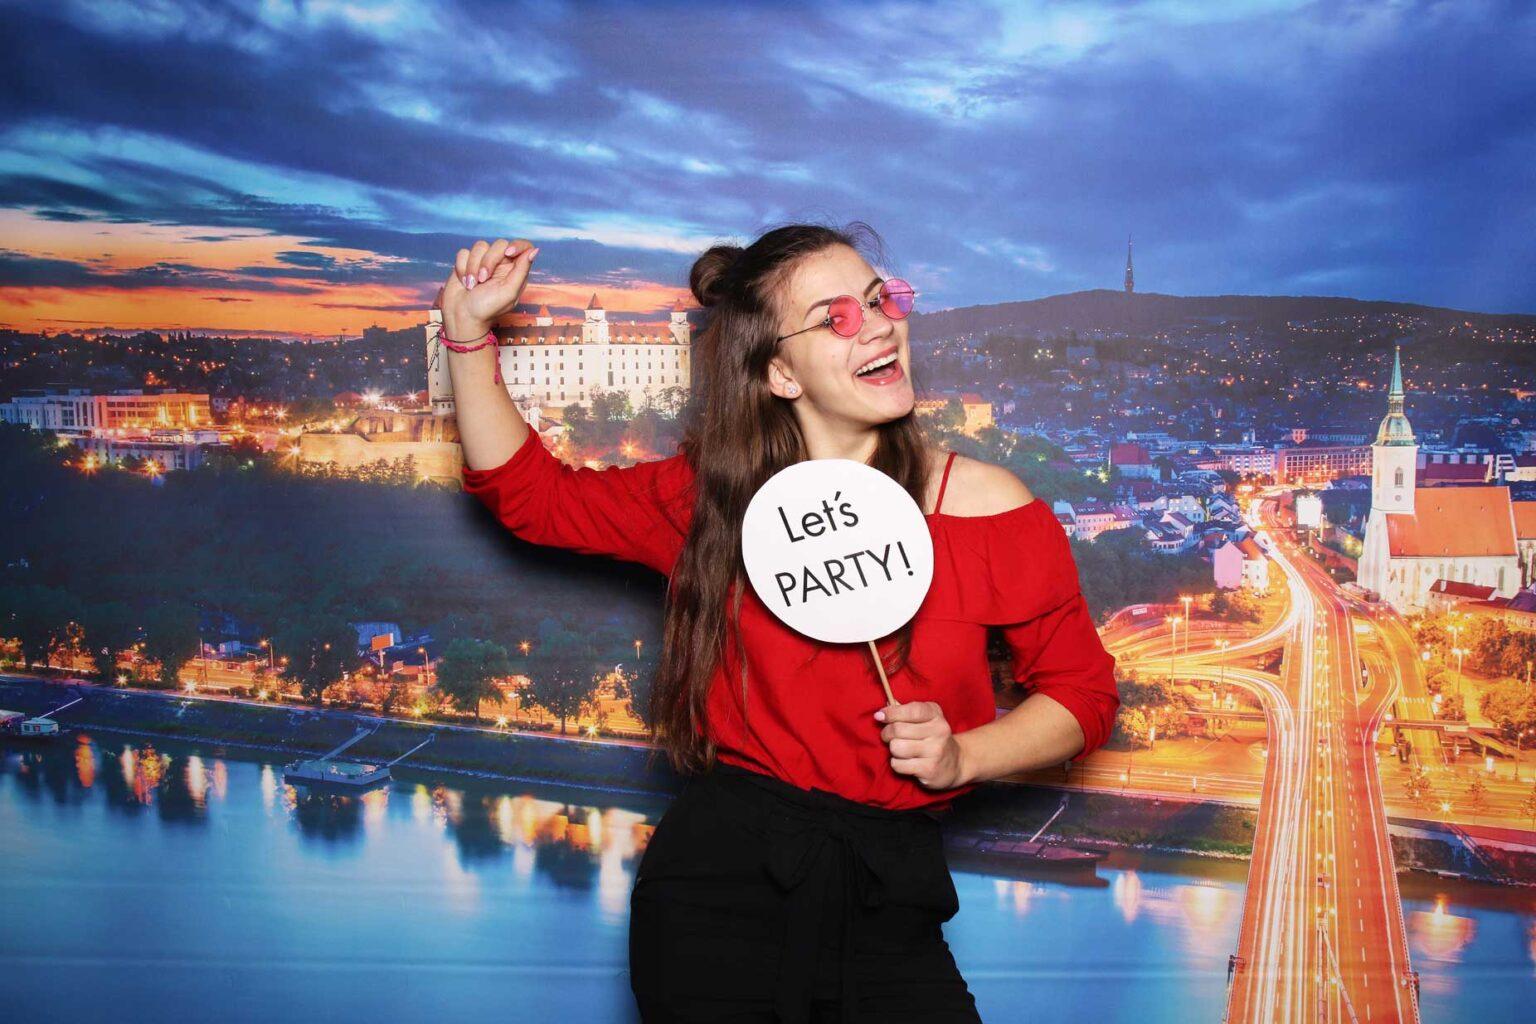 Pozadie Bratislava - fotokútik na firemný večierok - fotobox.